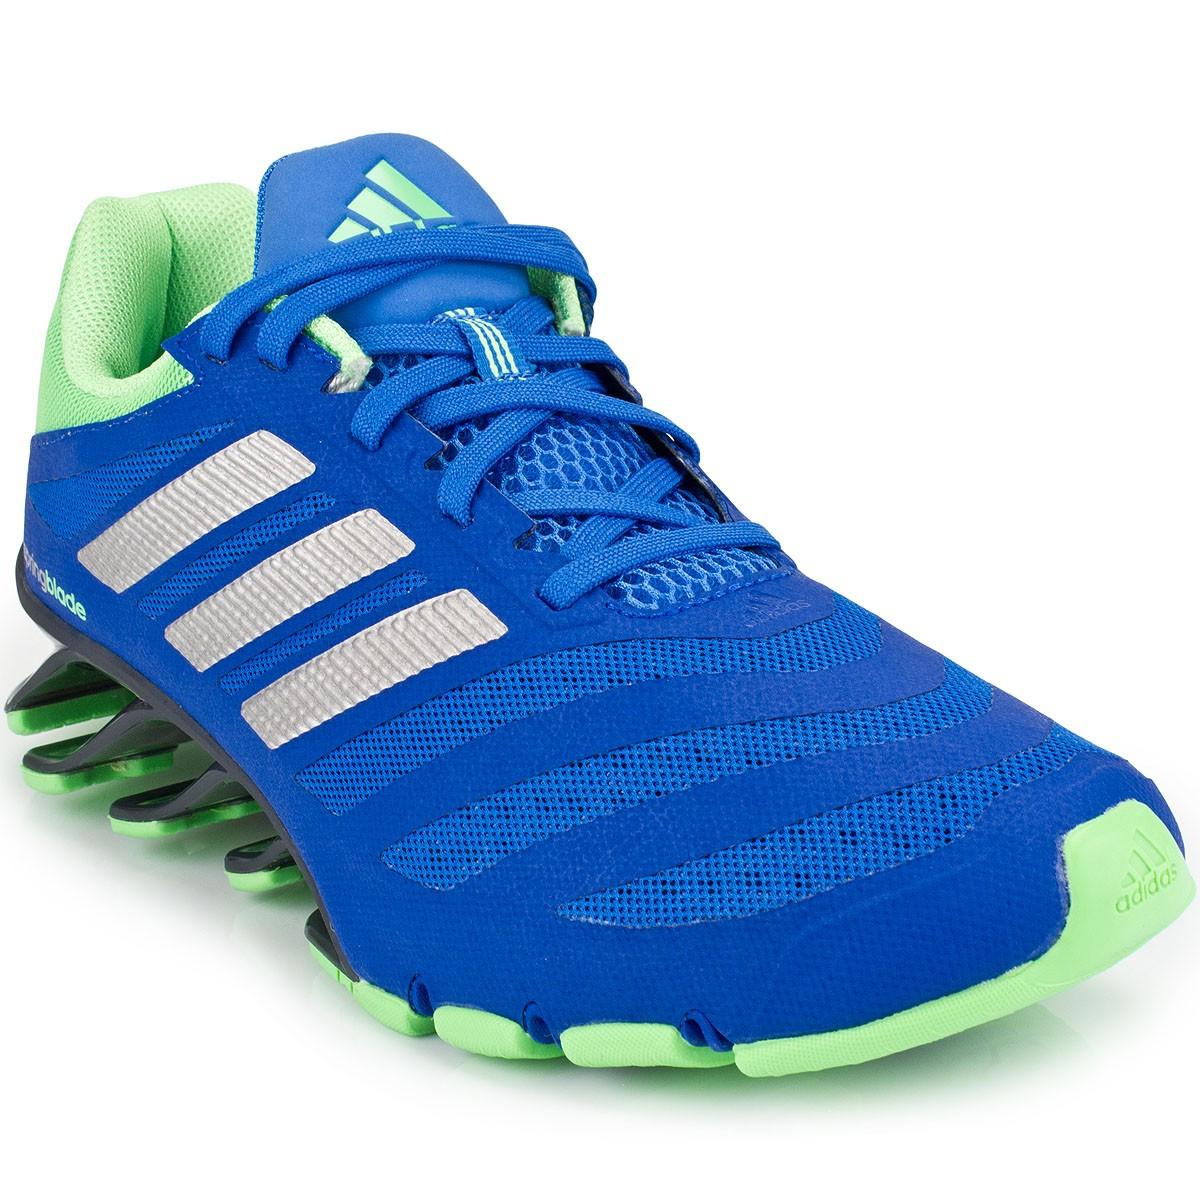 reputable site c007a 18cbf ... sale tênis adidas springblade ignite tf 2 b26795 7f464 9cb2a